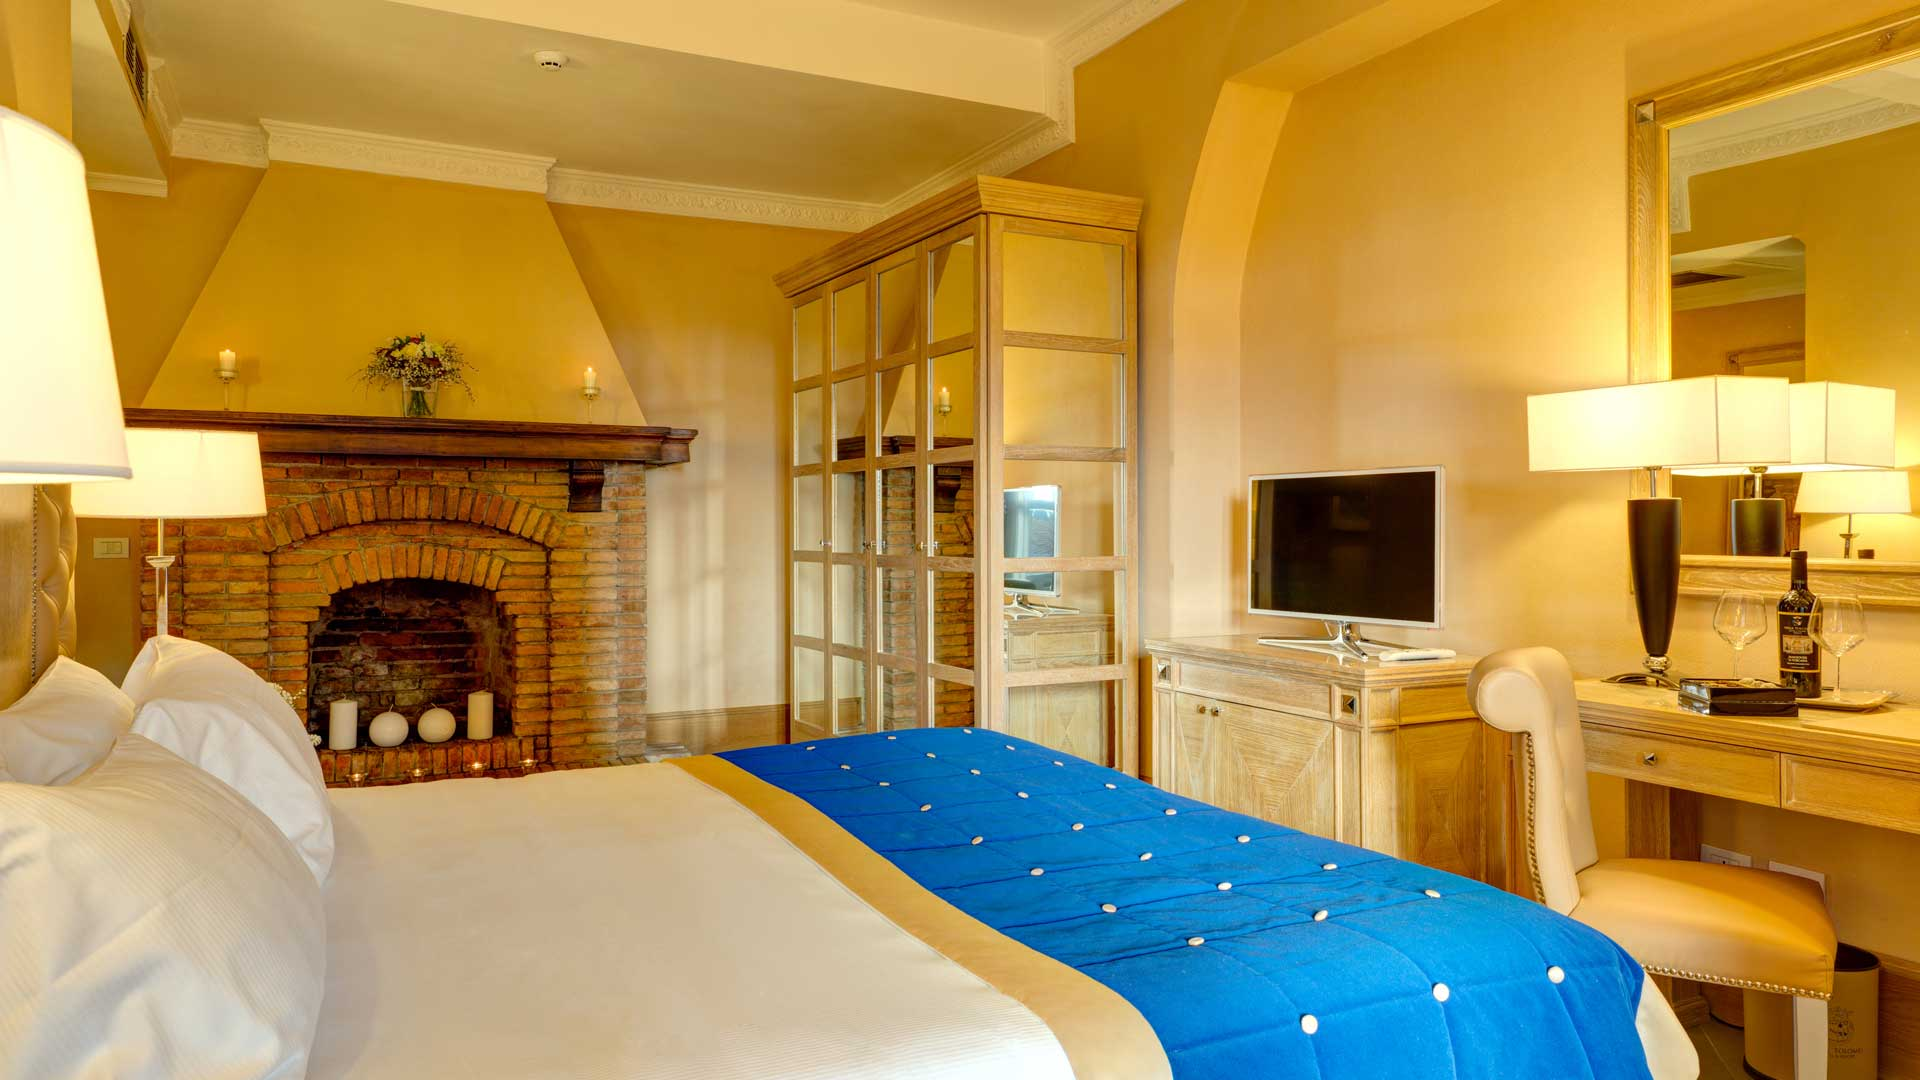 Club Room - Villa Tolomei Hotel & Resort 5 stelle